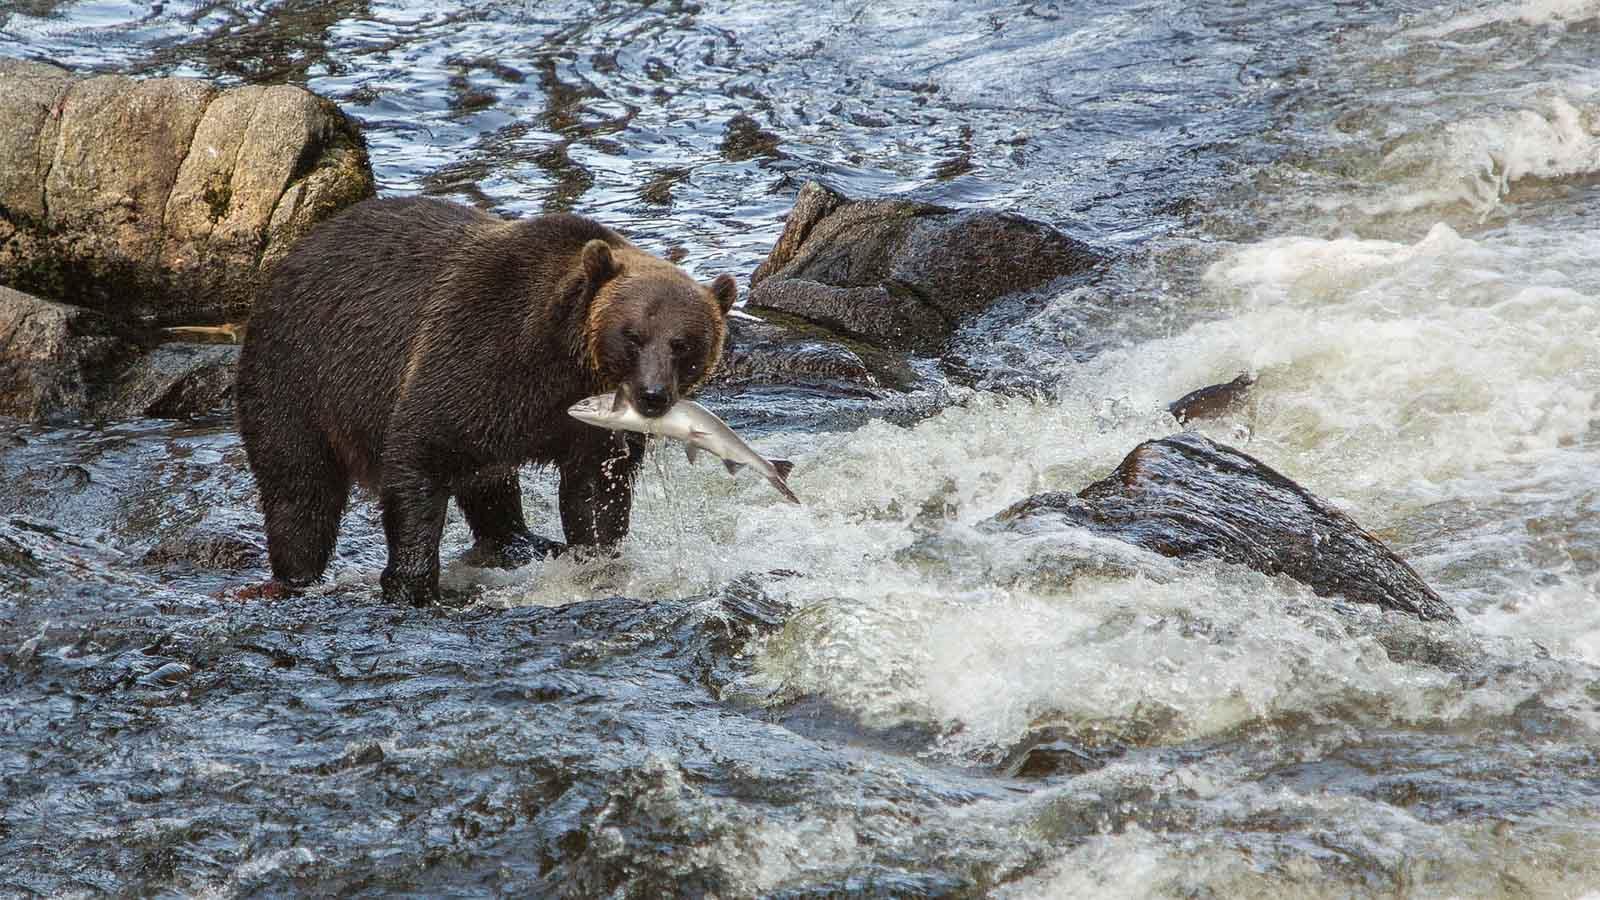 Spirit of the Yukon: Teslin River - Bear